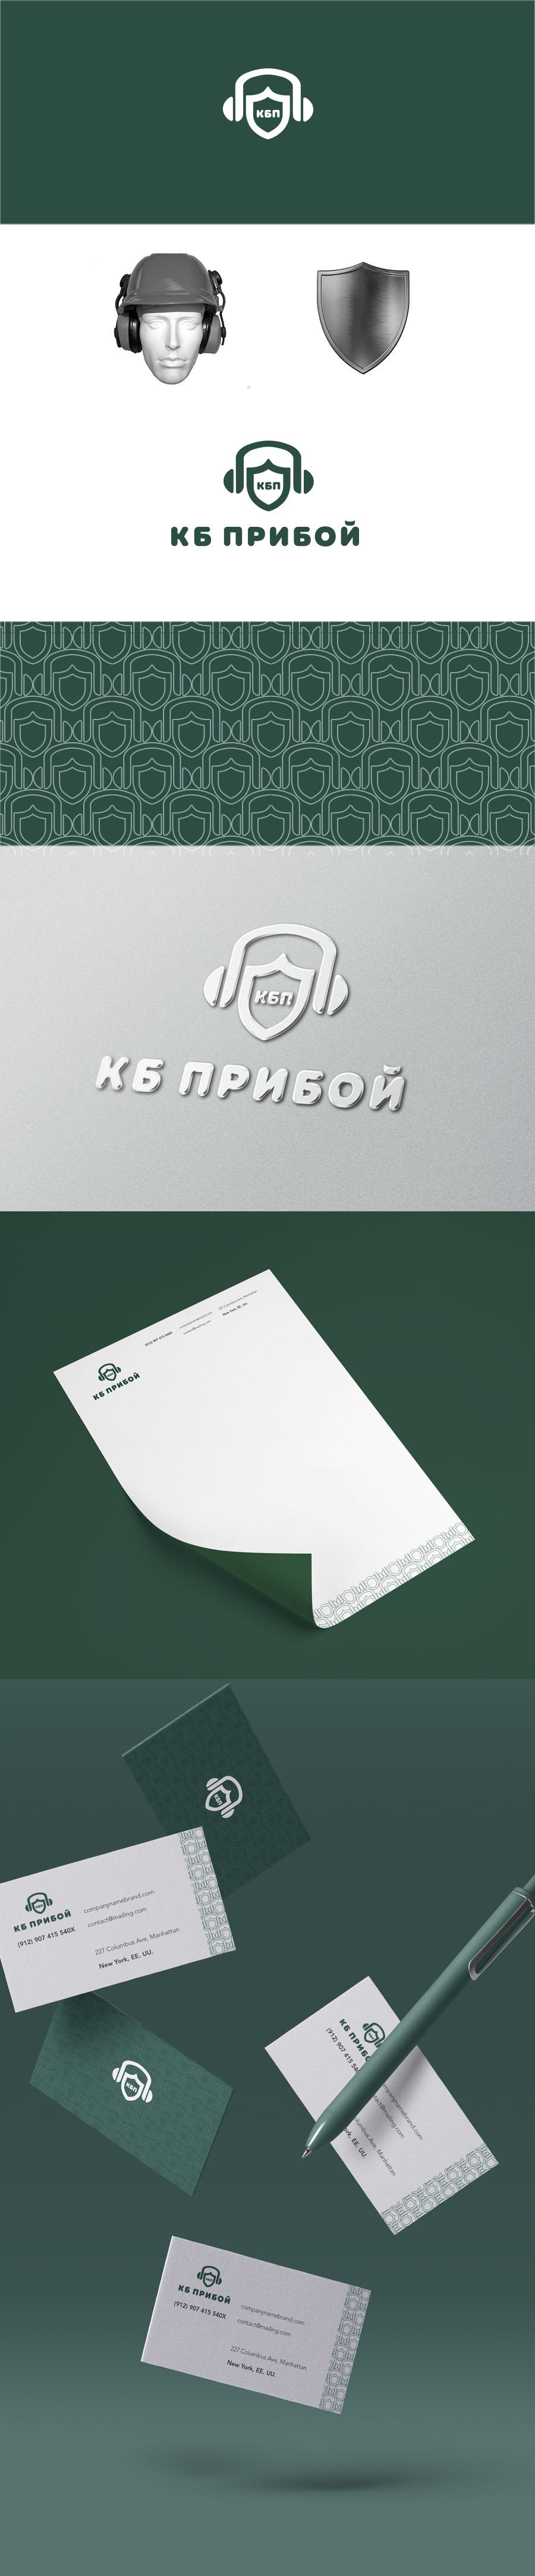 Разработка логотипа и фирменного стиля для КБ Прибой фото f_7795b28d445716f8.jpg